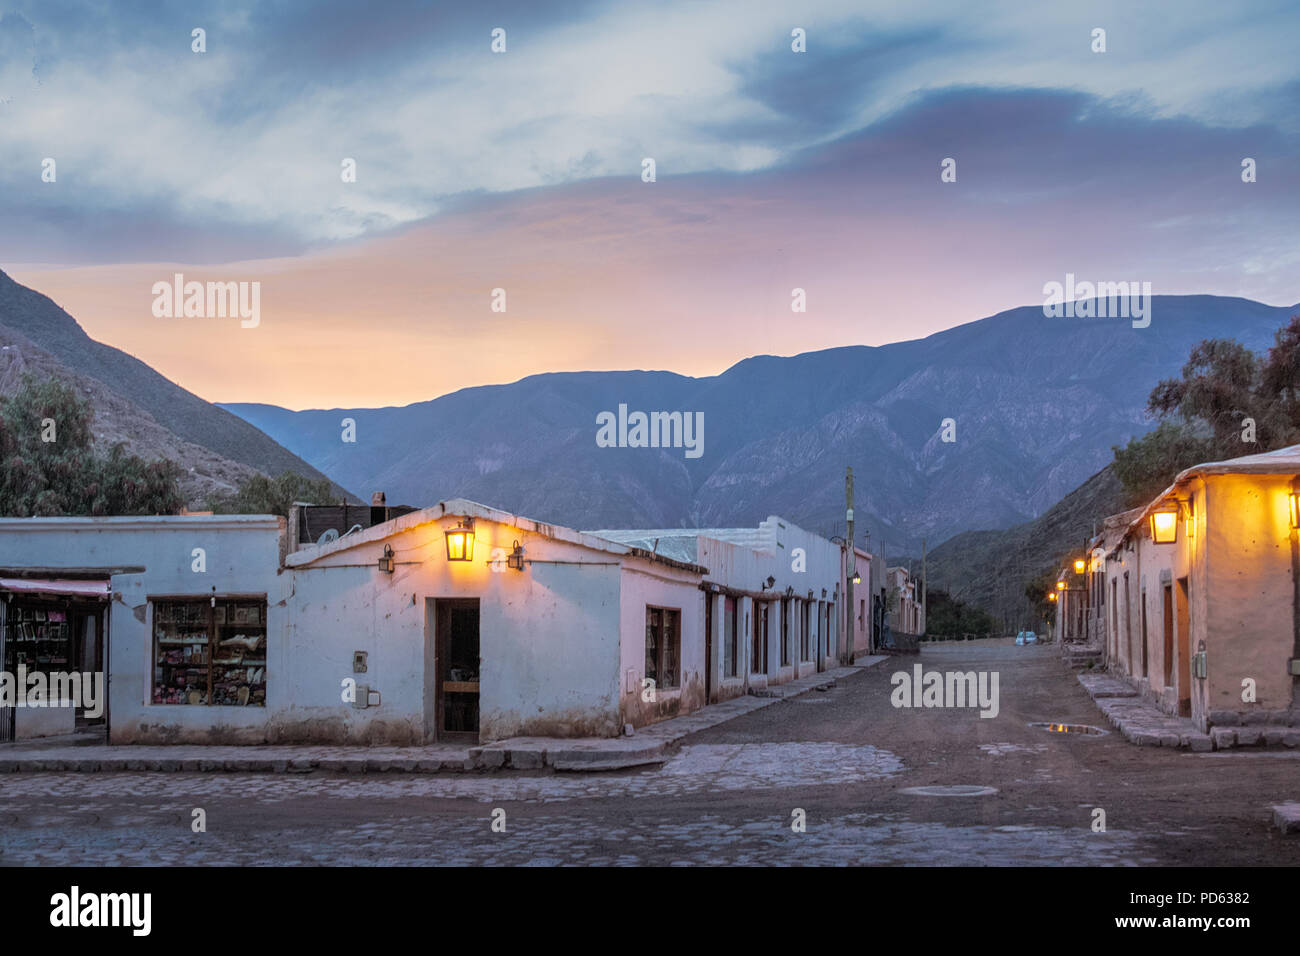 Purmamarca town at night - Purmamarca, Jujuy, Argentina - Stock Image